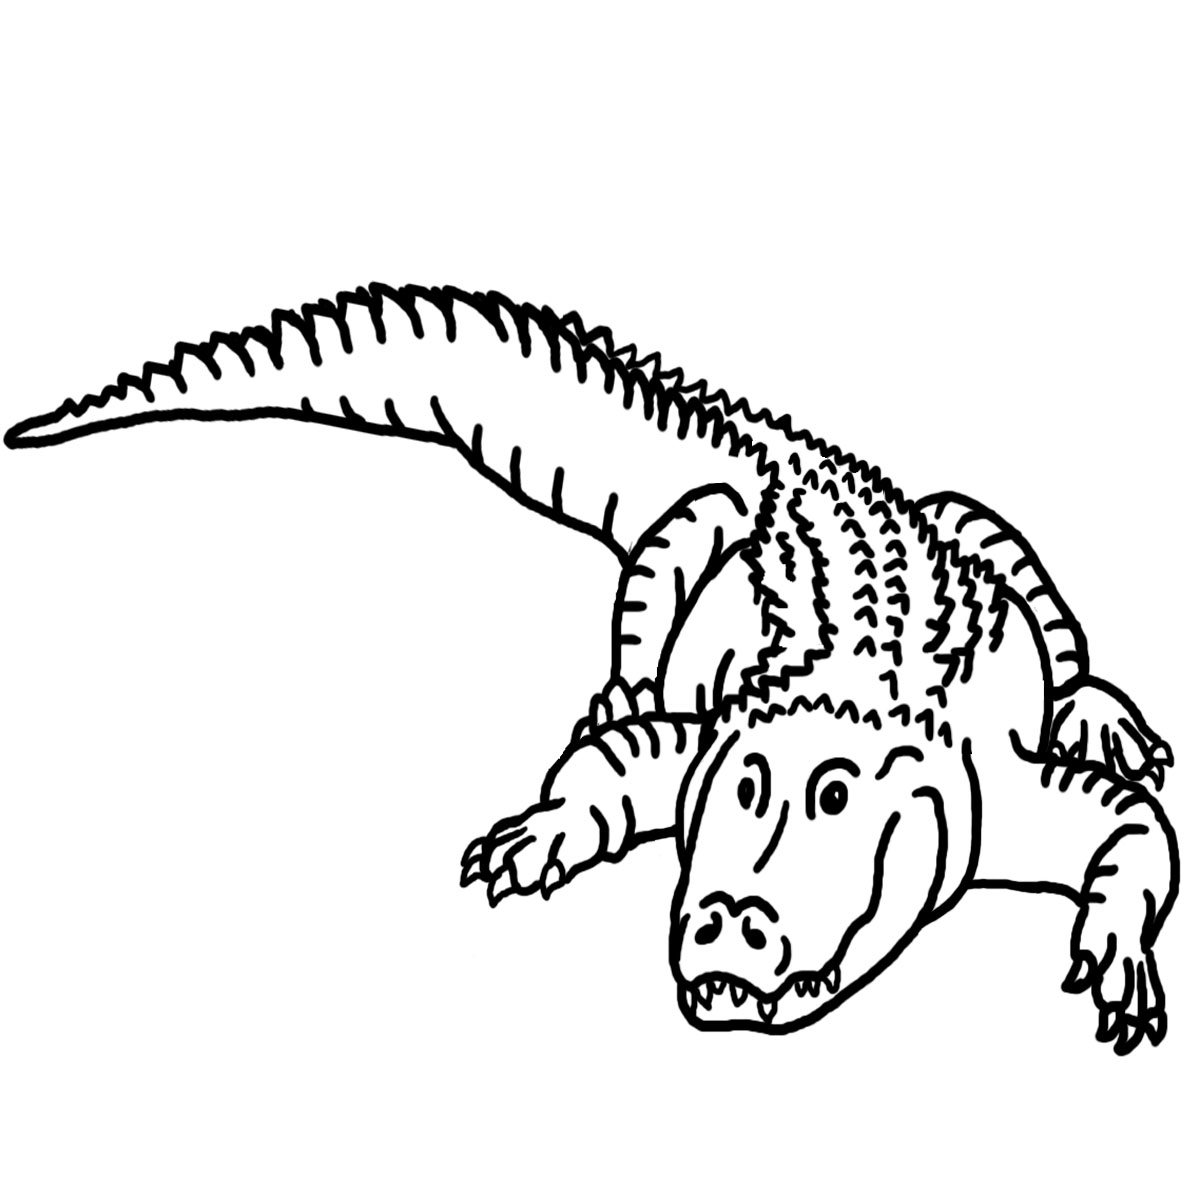 Alligator  black and white black and white clipart alligator clipartfest